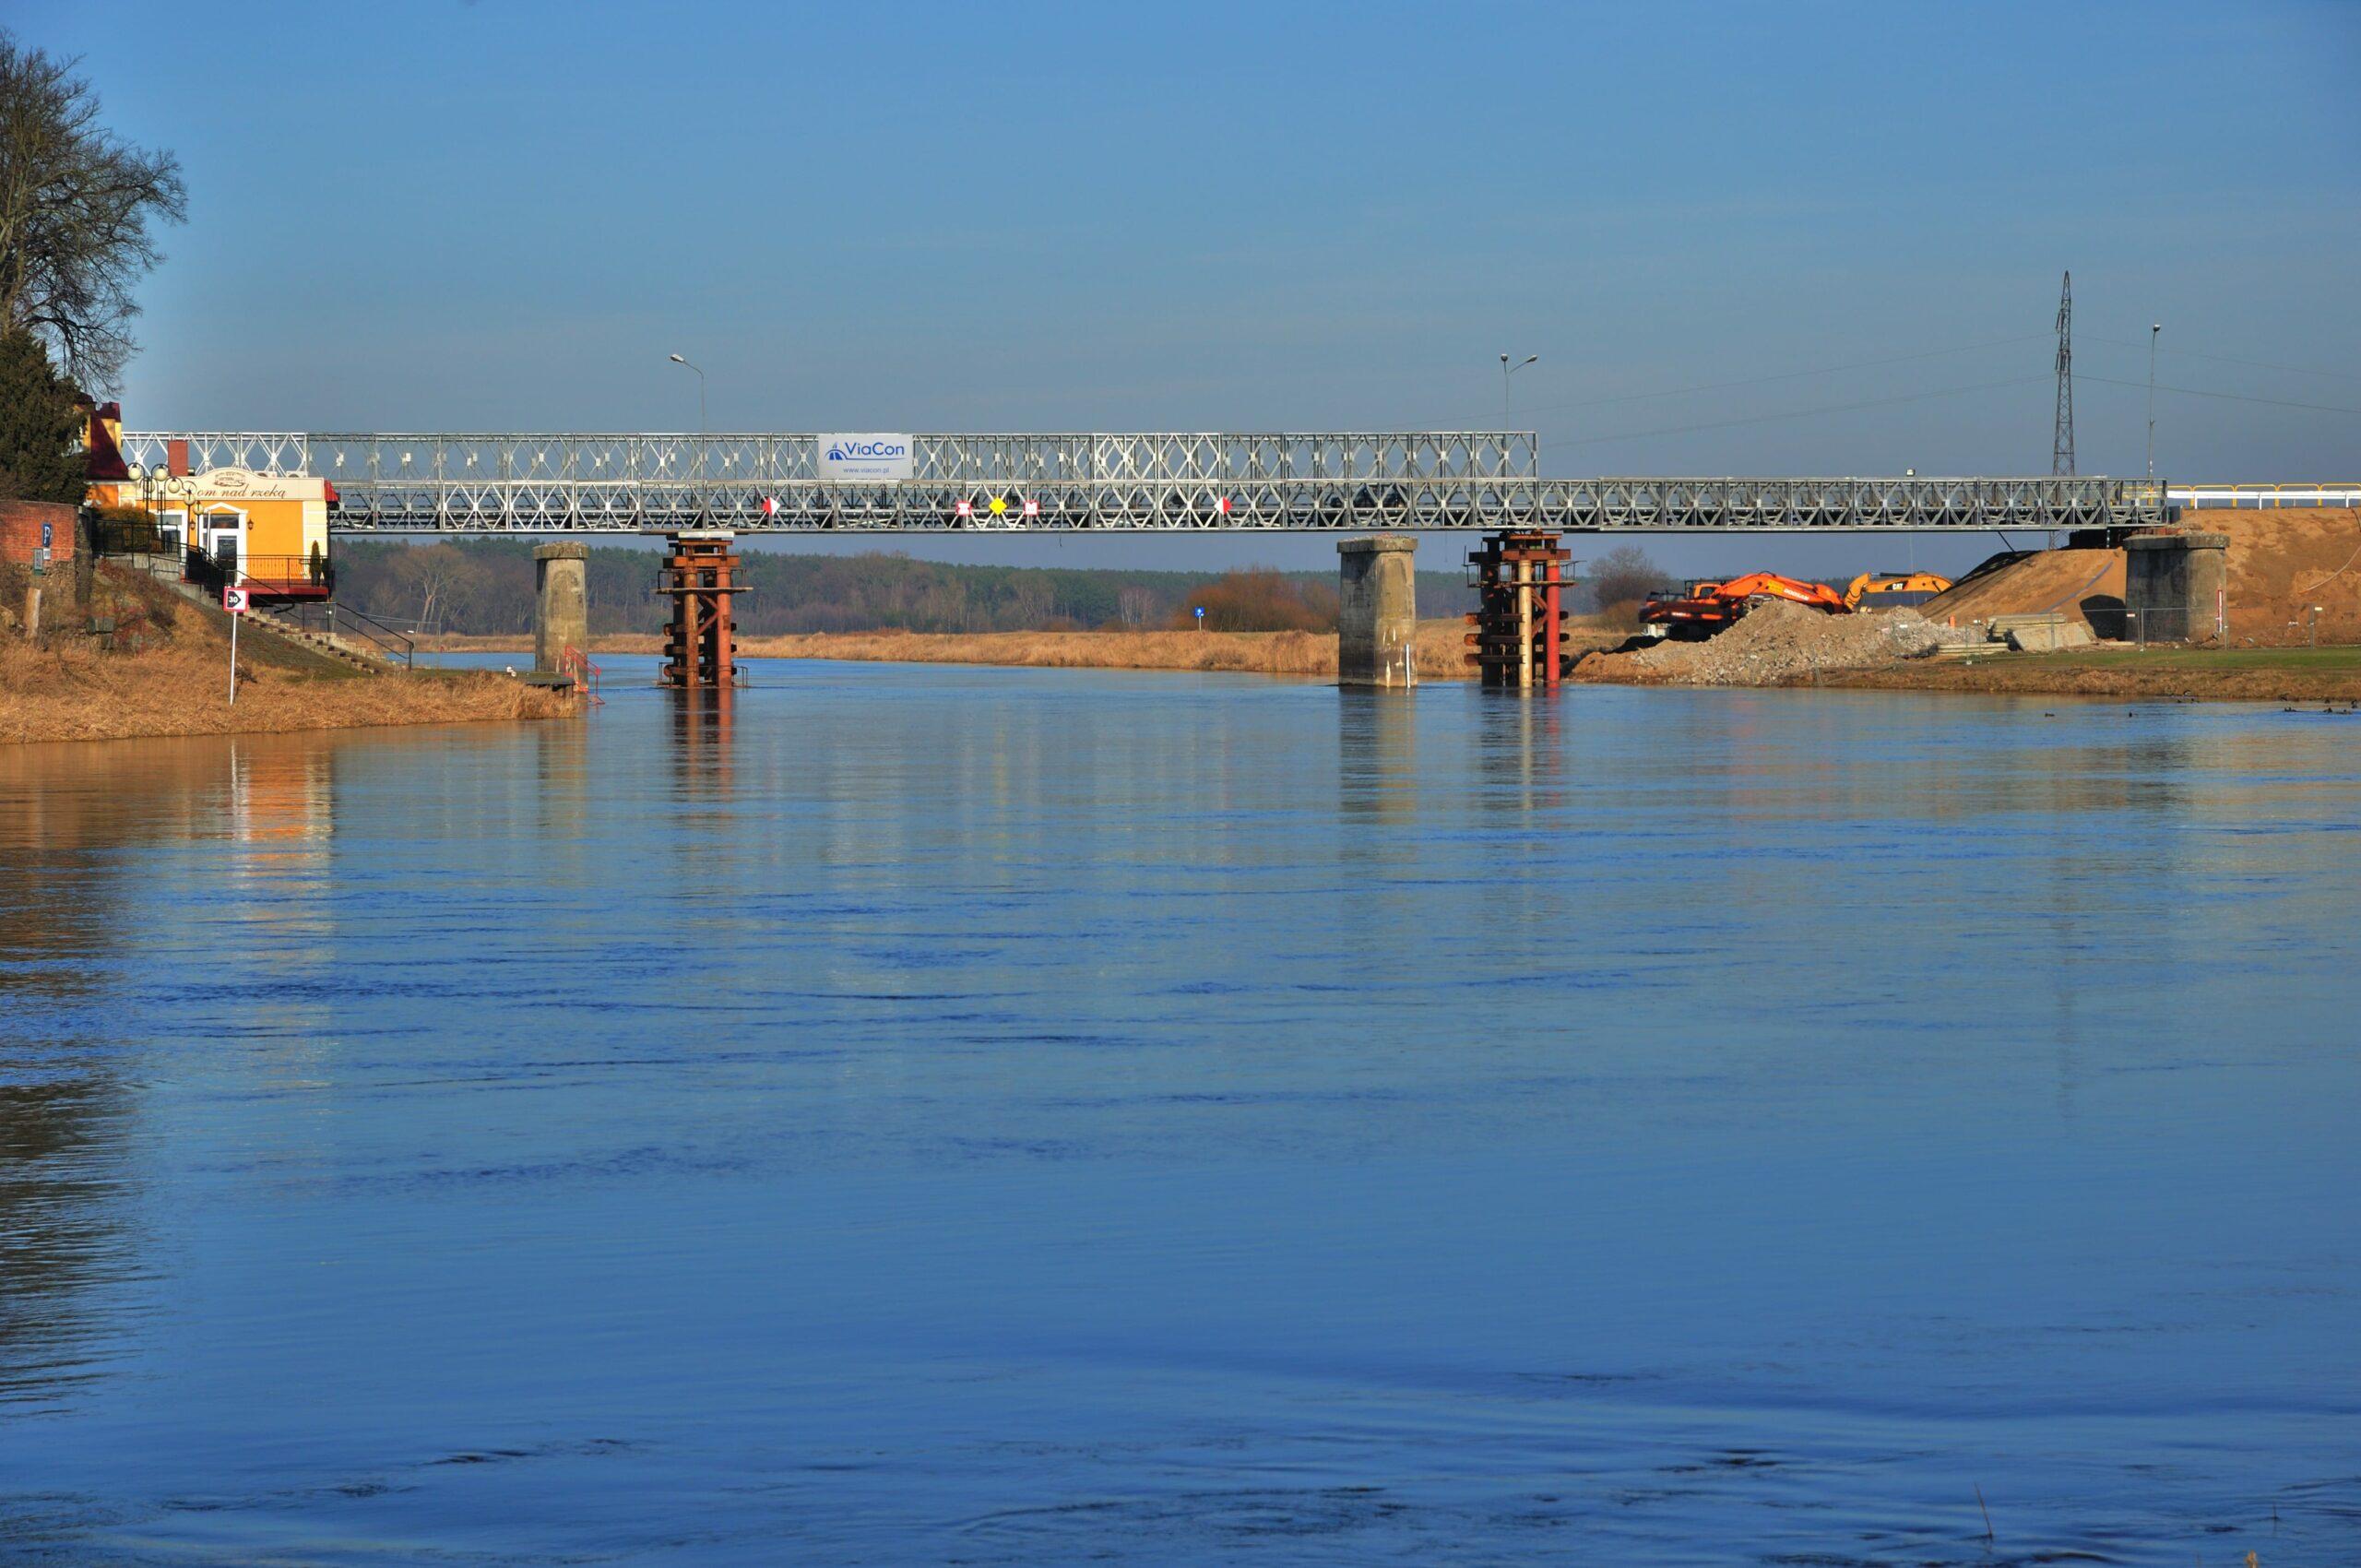 ViaCon Acrow bridge